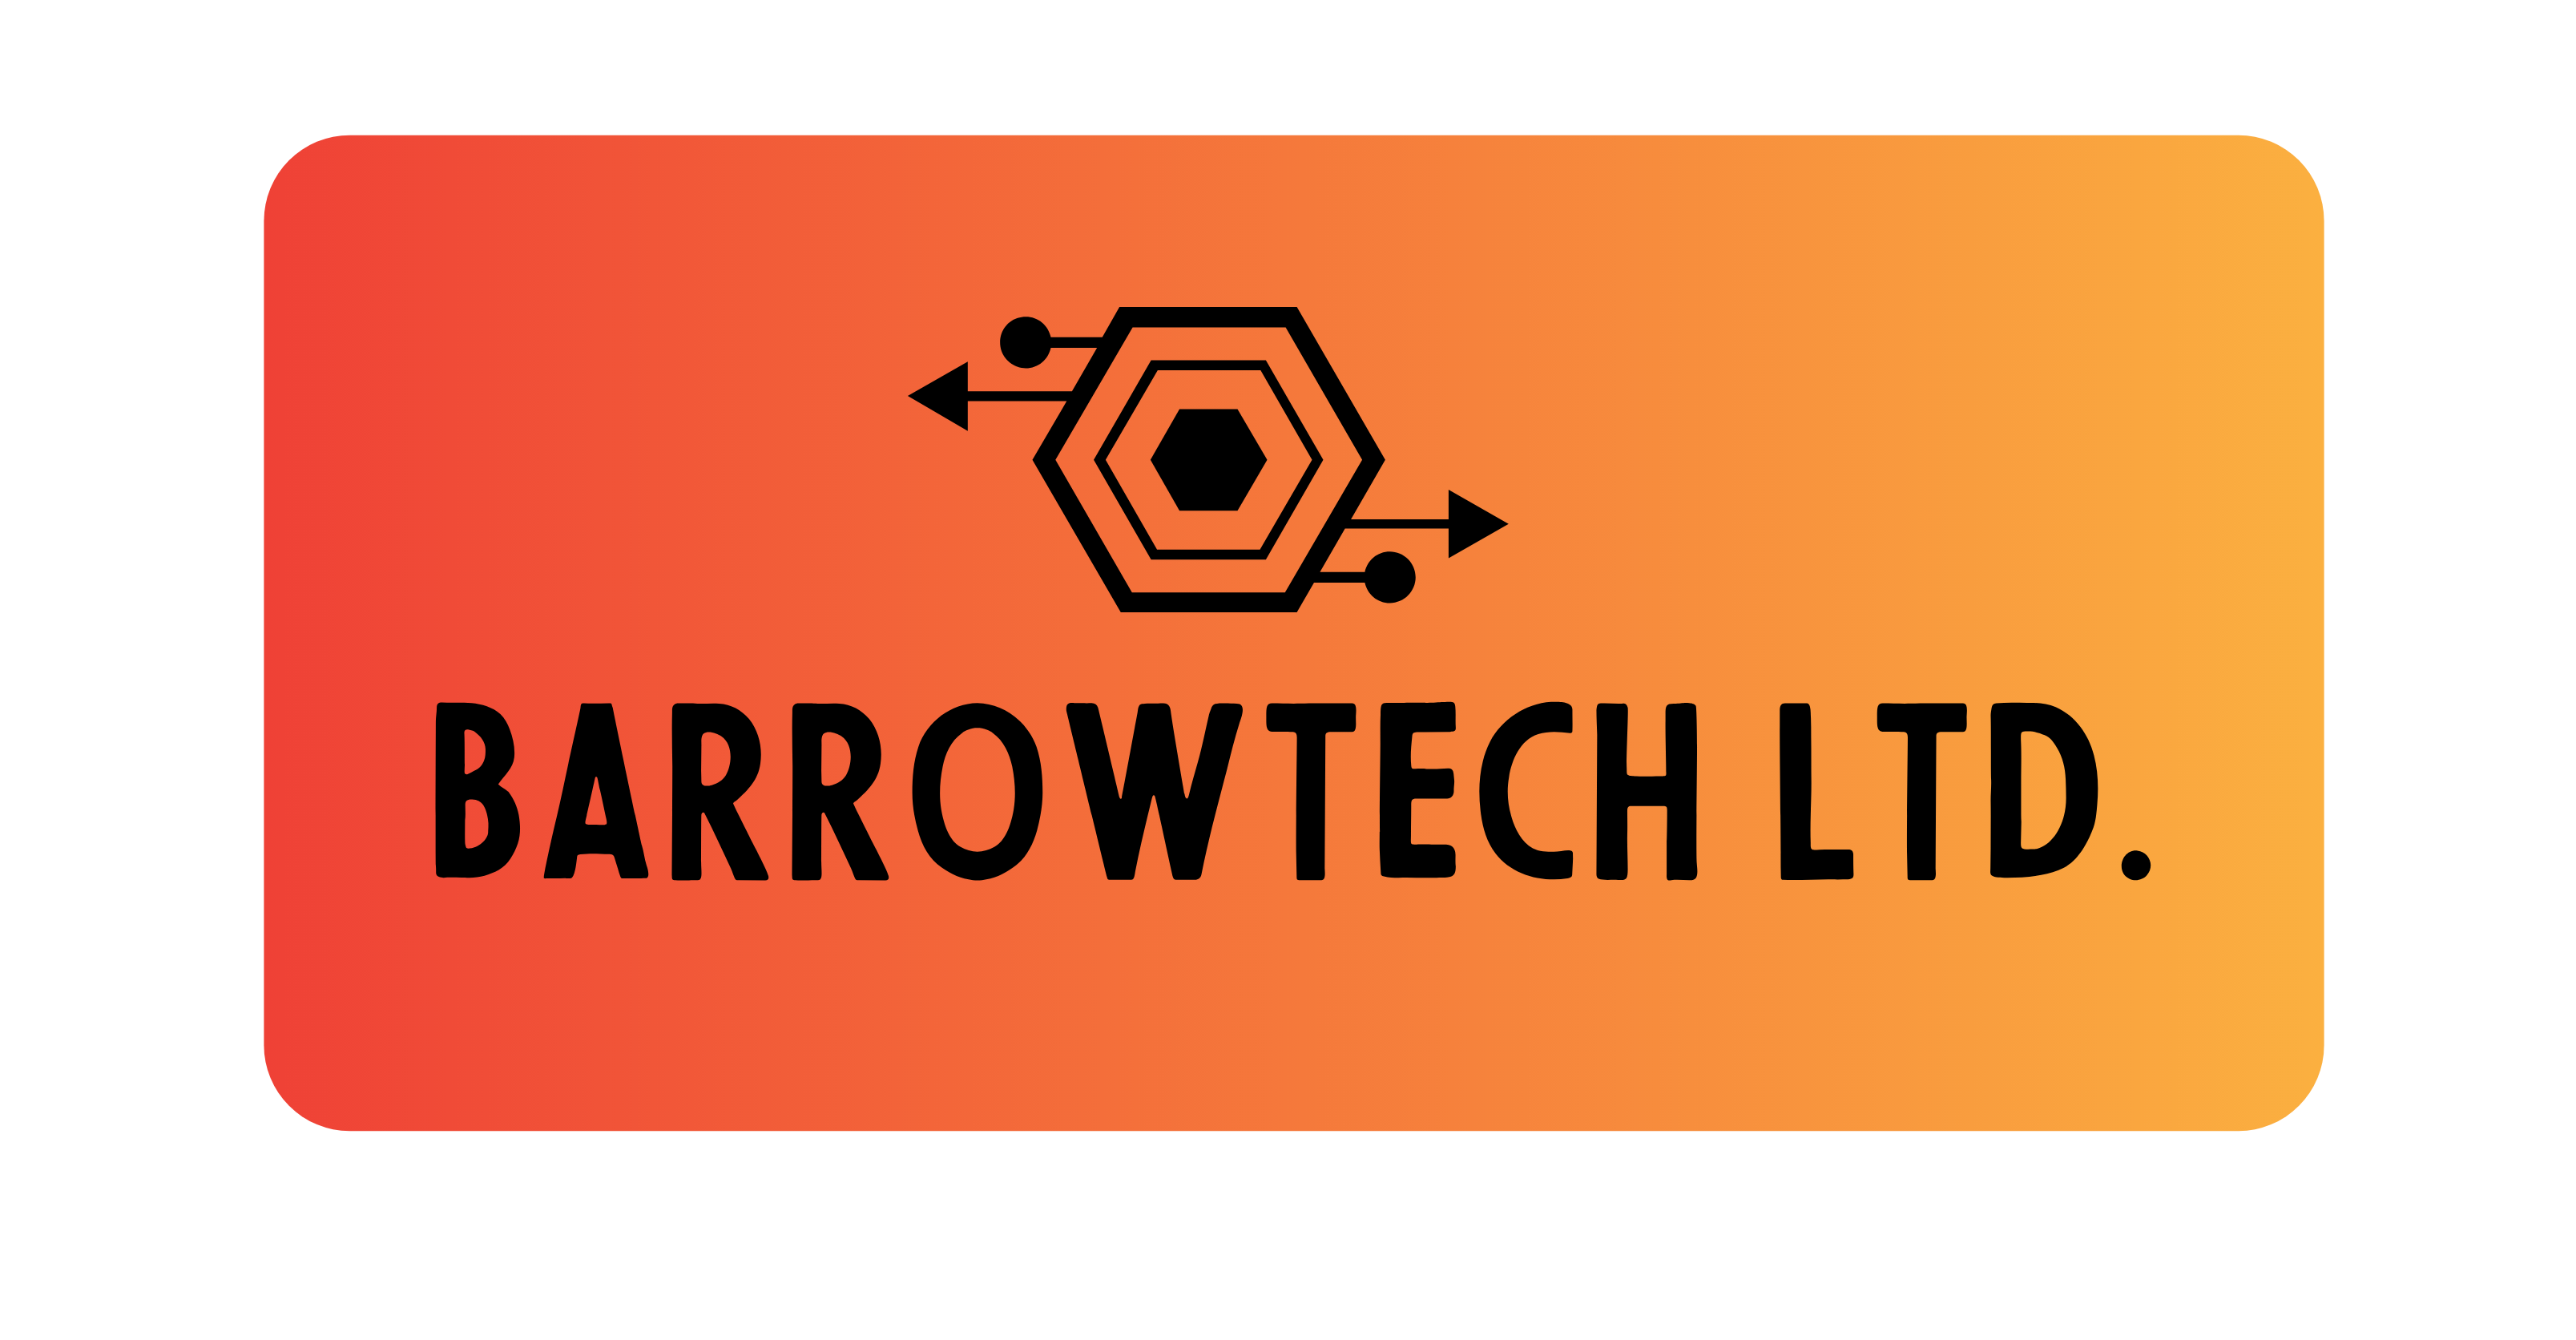 BarrowTech Ltd.